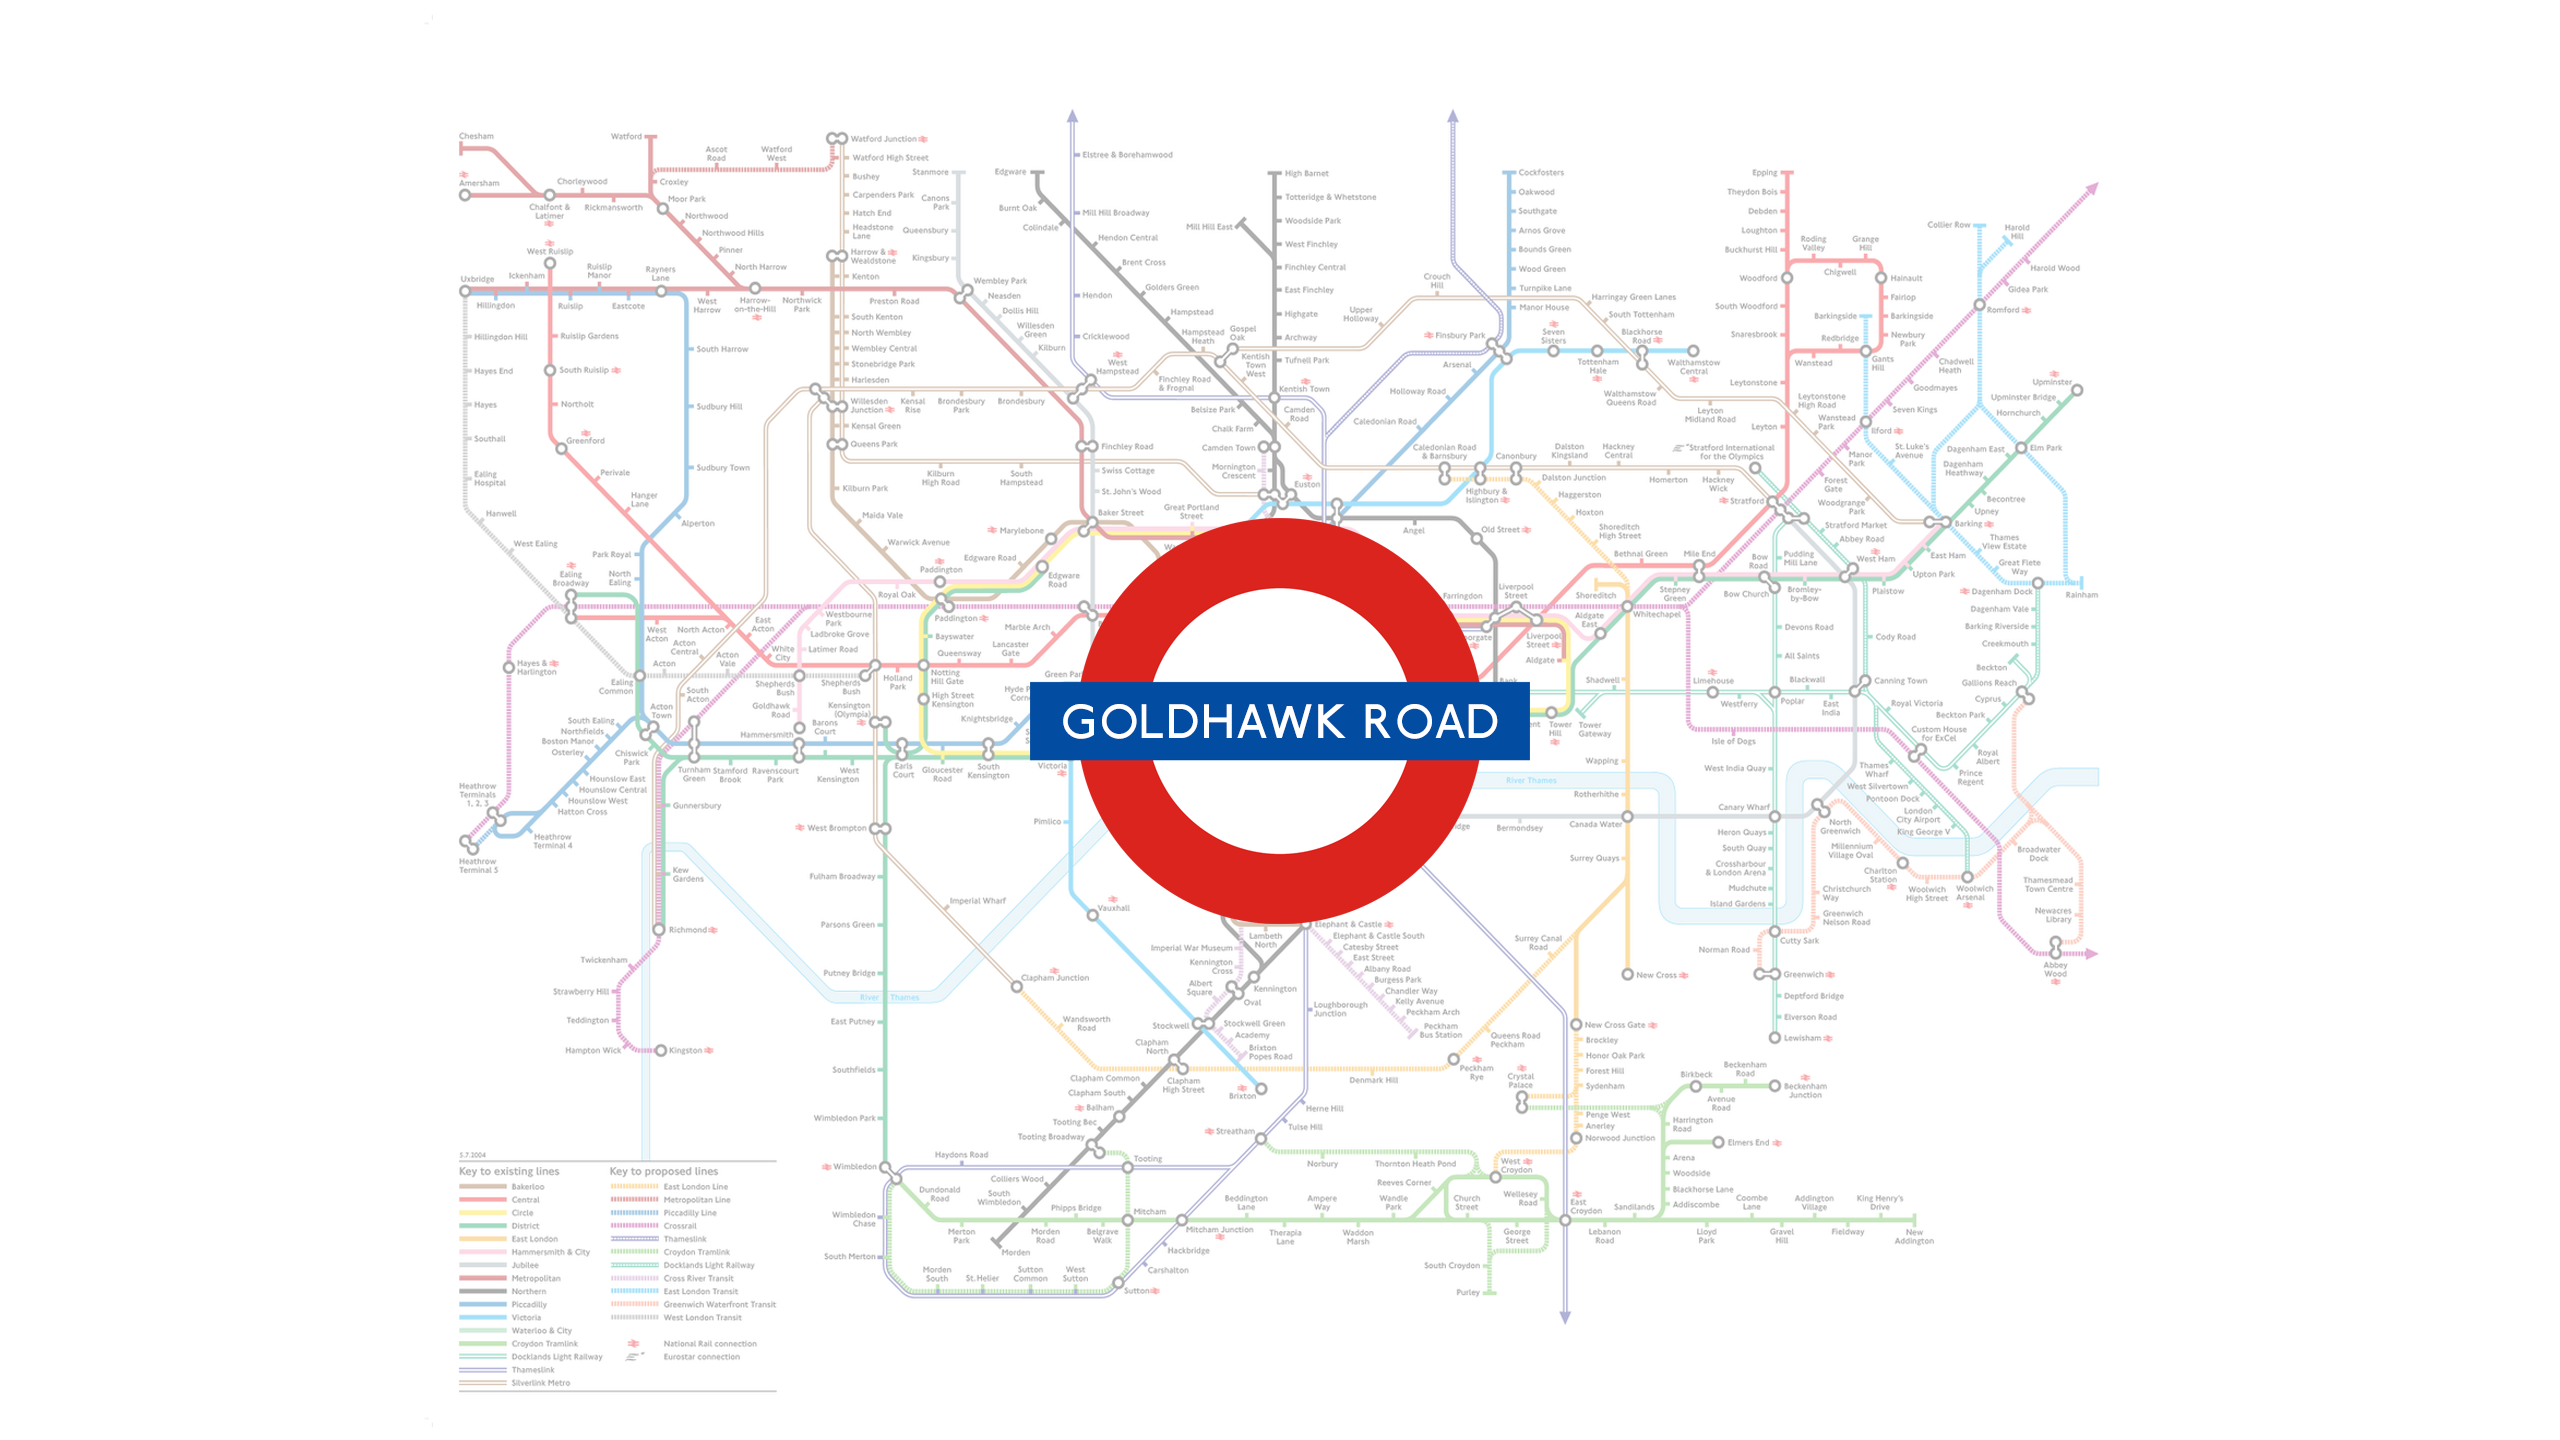 Goldhawk Road (Map)